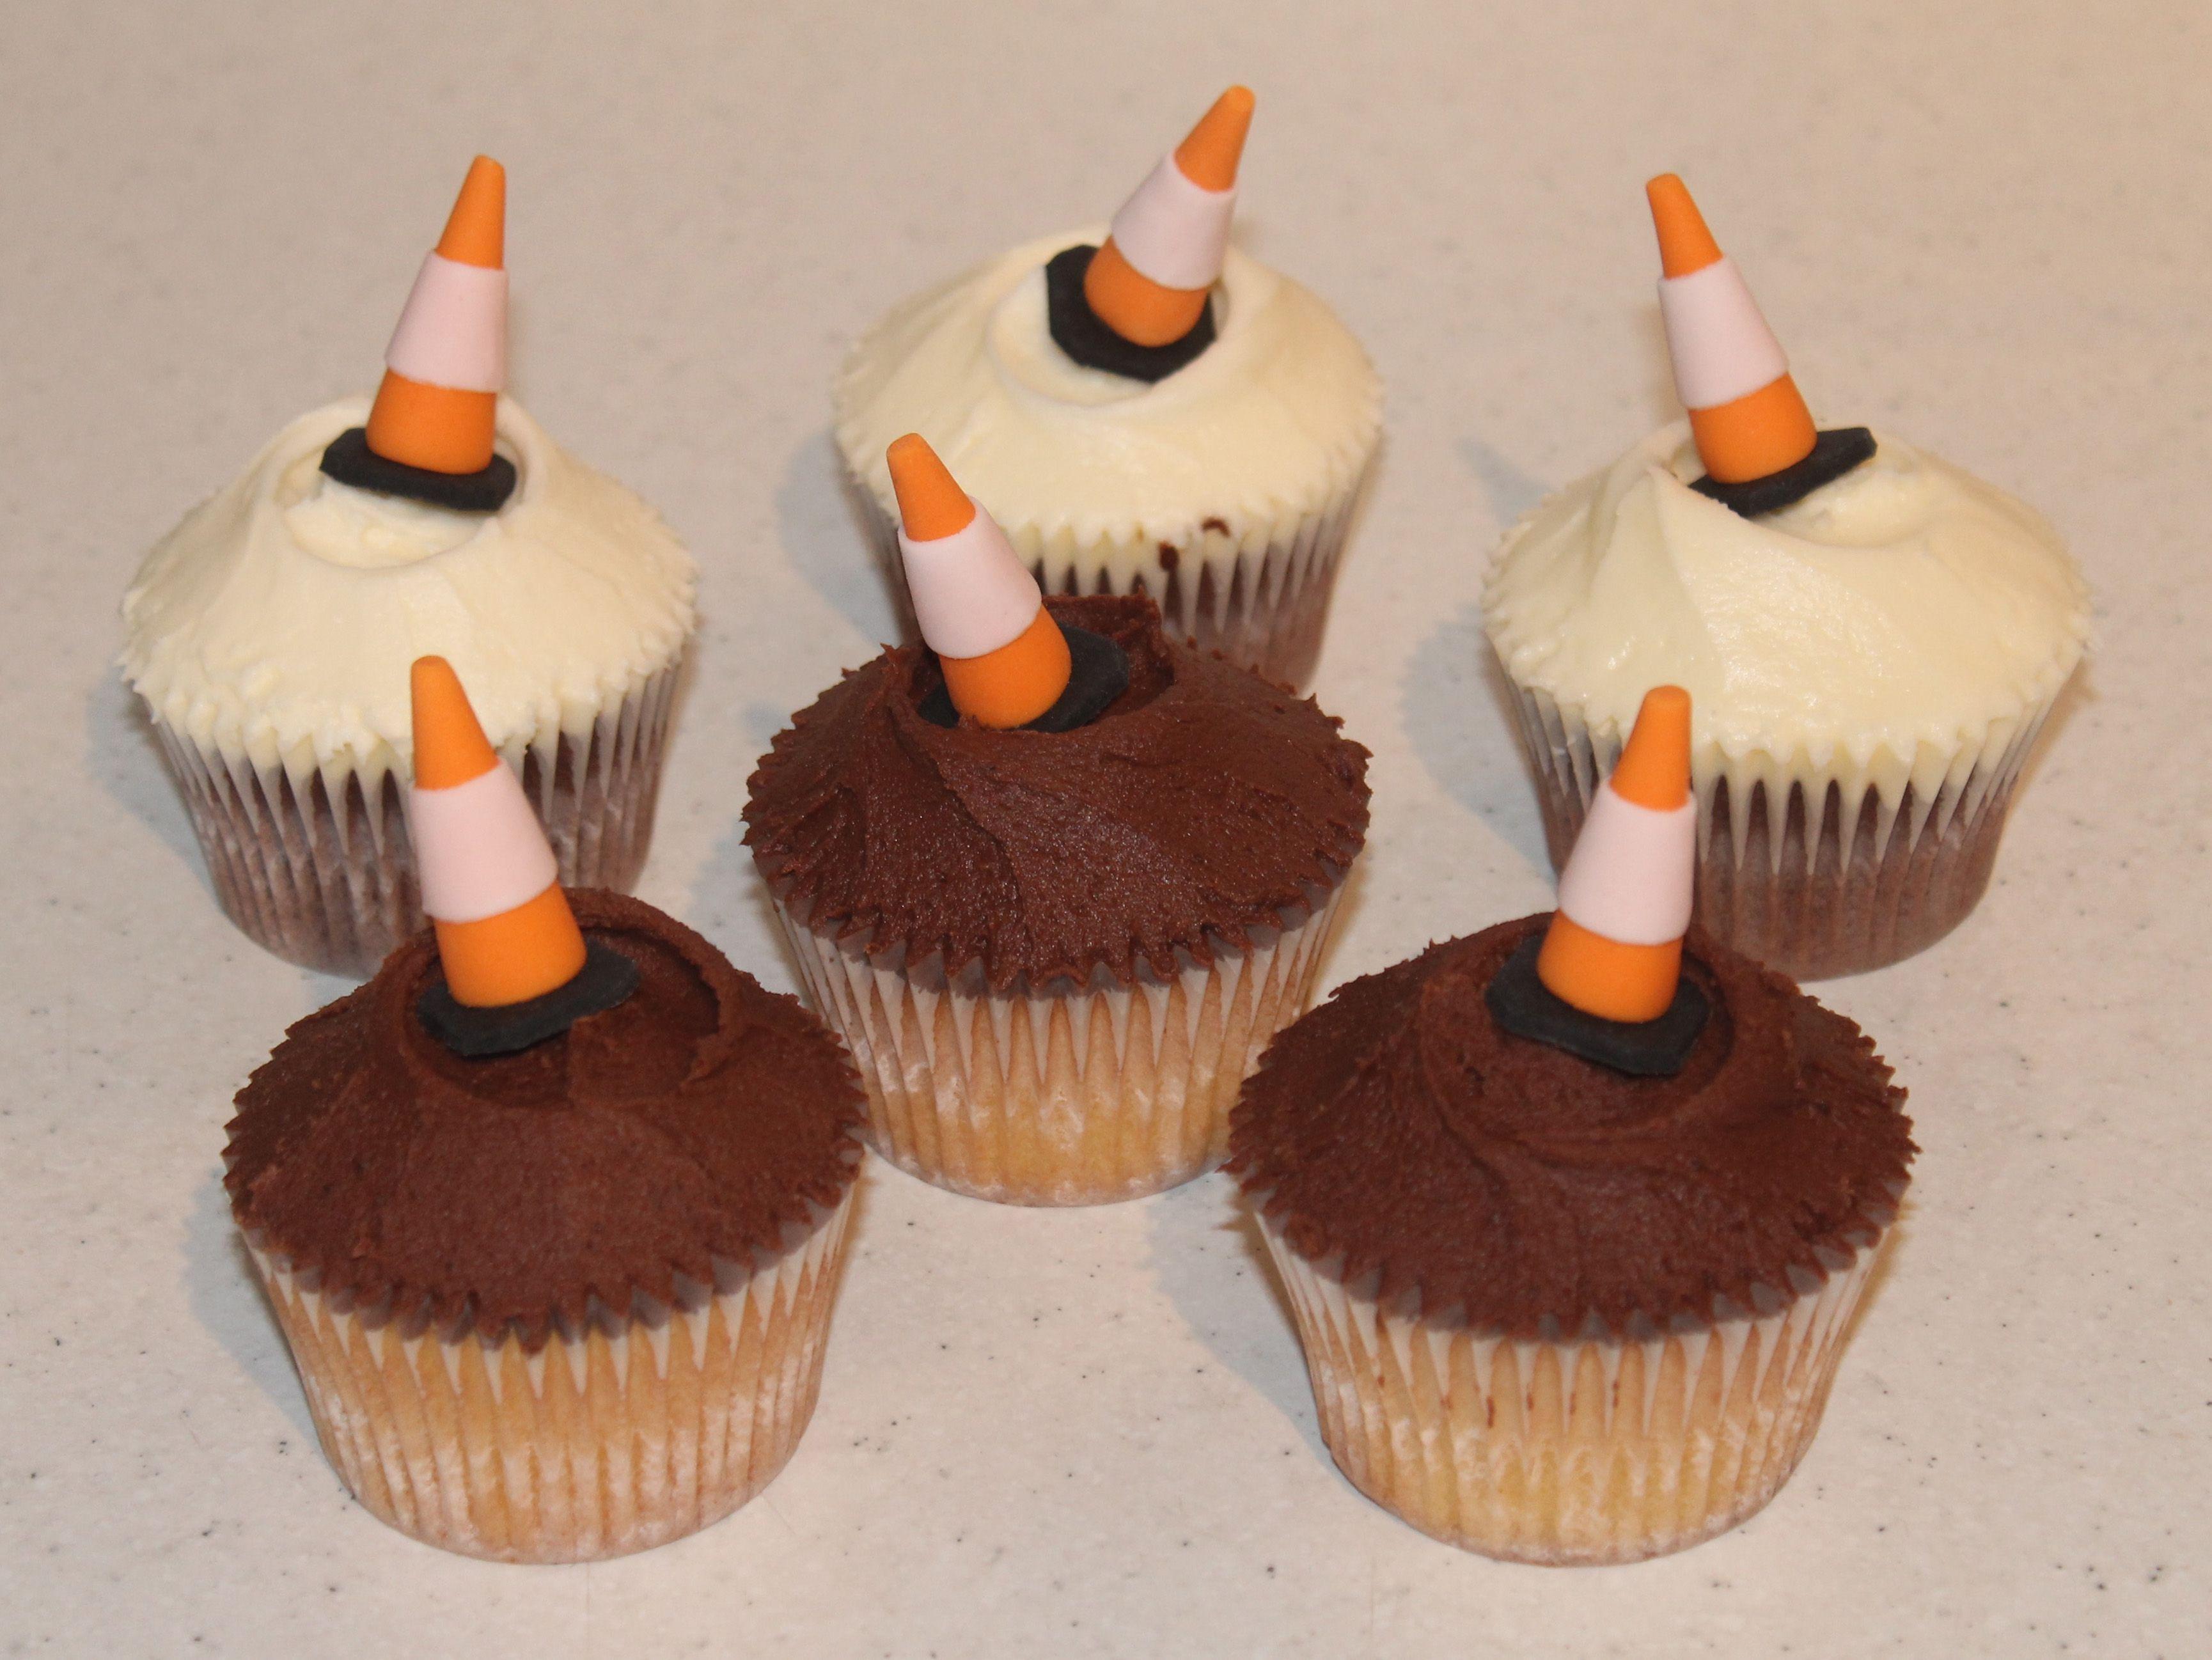 Traffic Cone Cupcakes With Images Cupcake Cones Cupcake Cakes